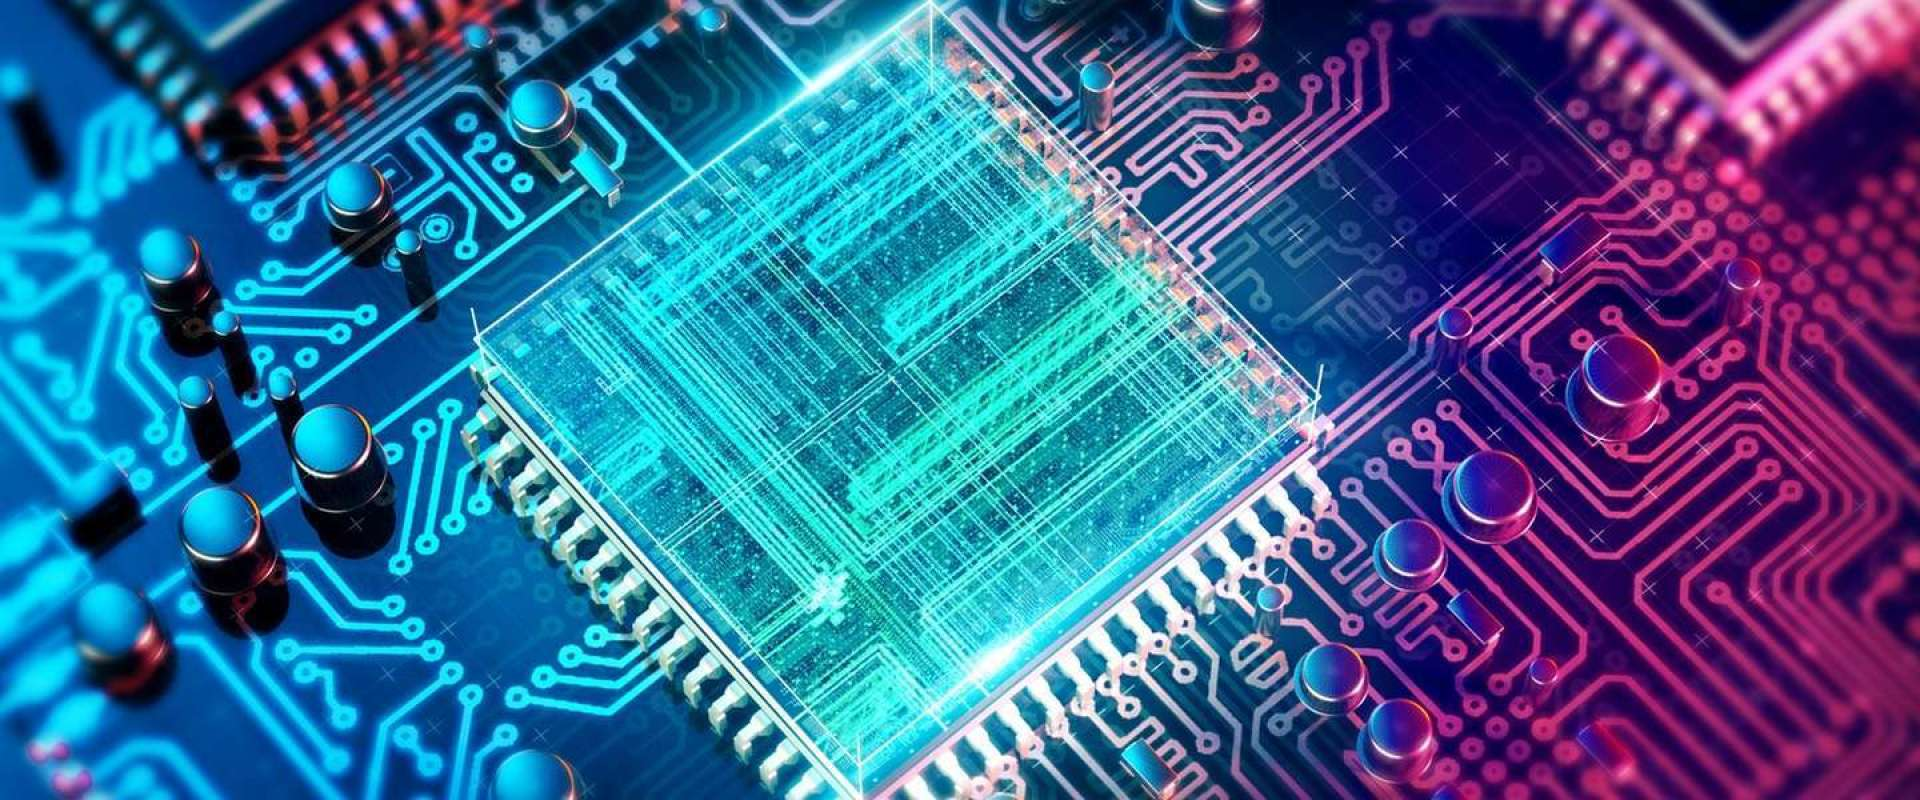 Intel-chip-hack